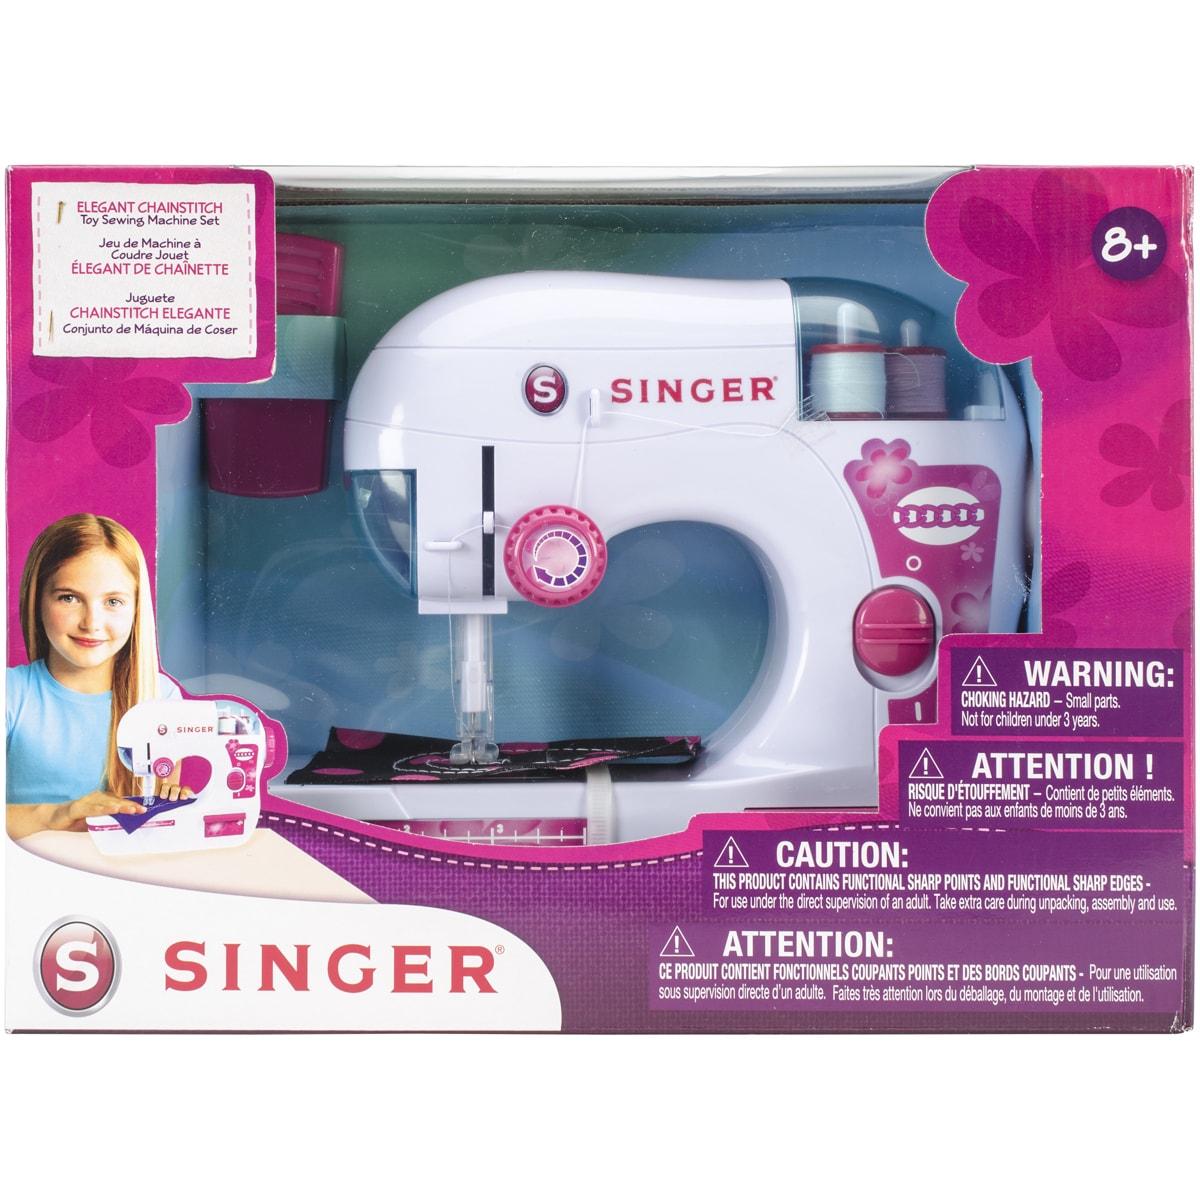 SINGER SEWING CO. A2214 Elegant Chain-stitch Sewing Machi...